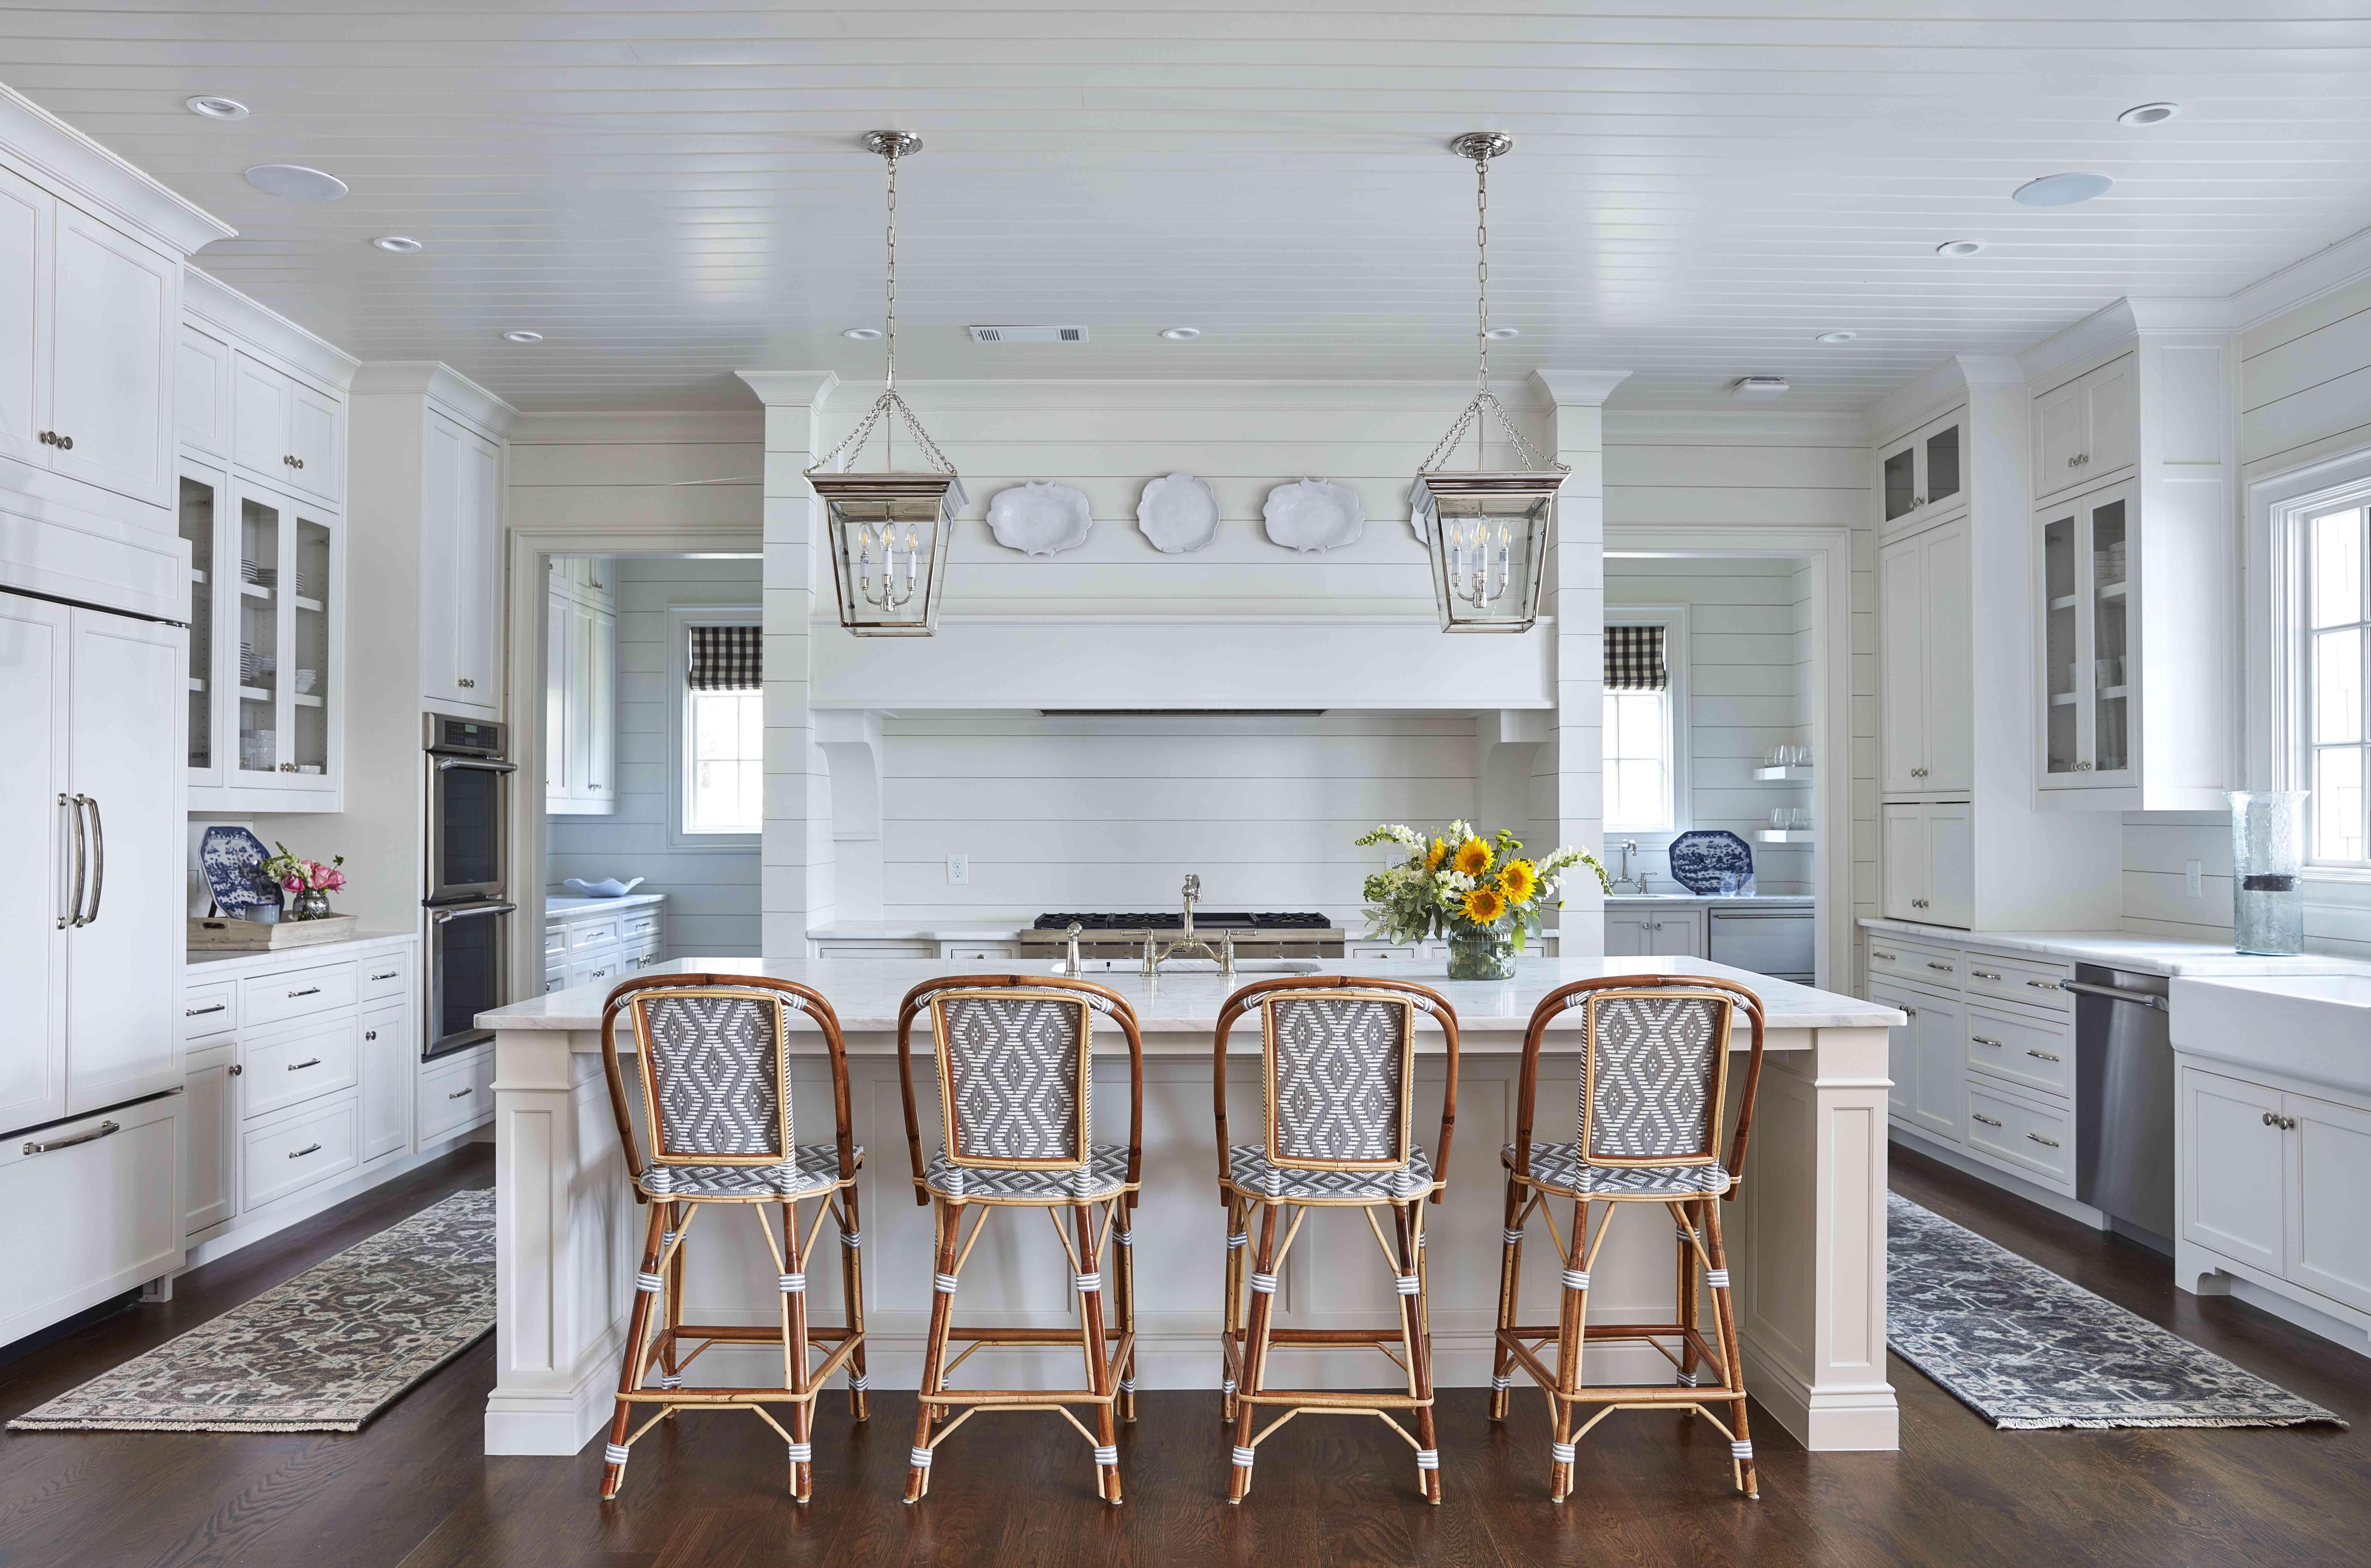 Kitchen with farmhouse details